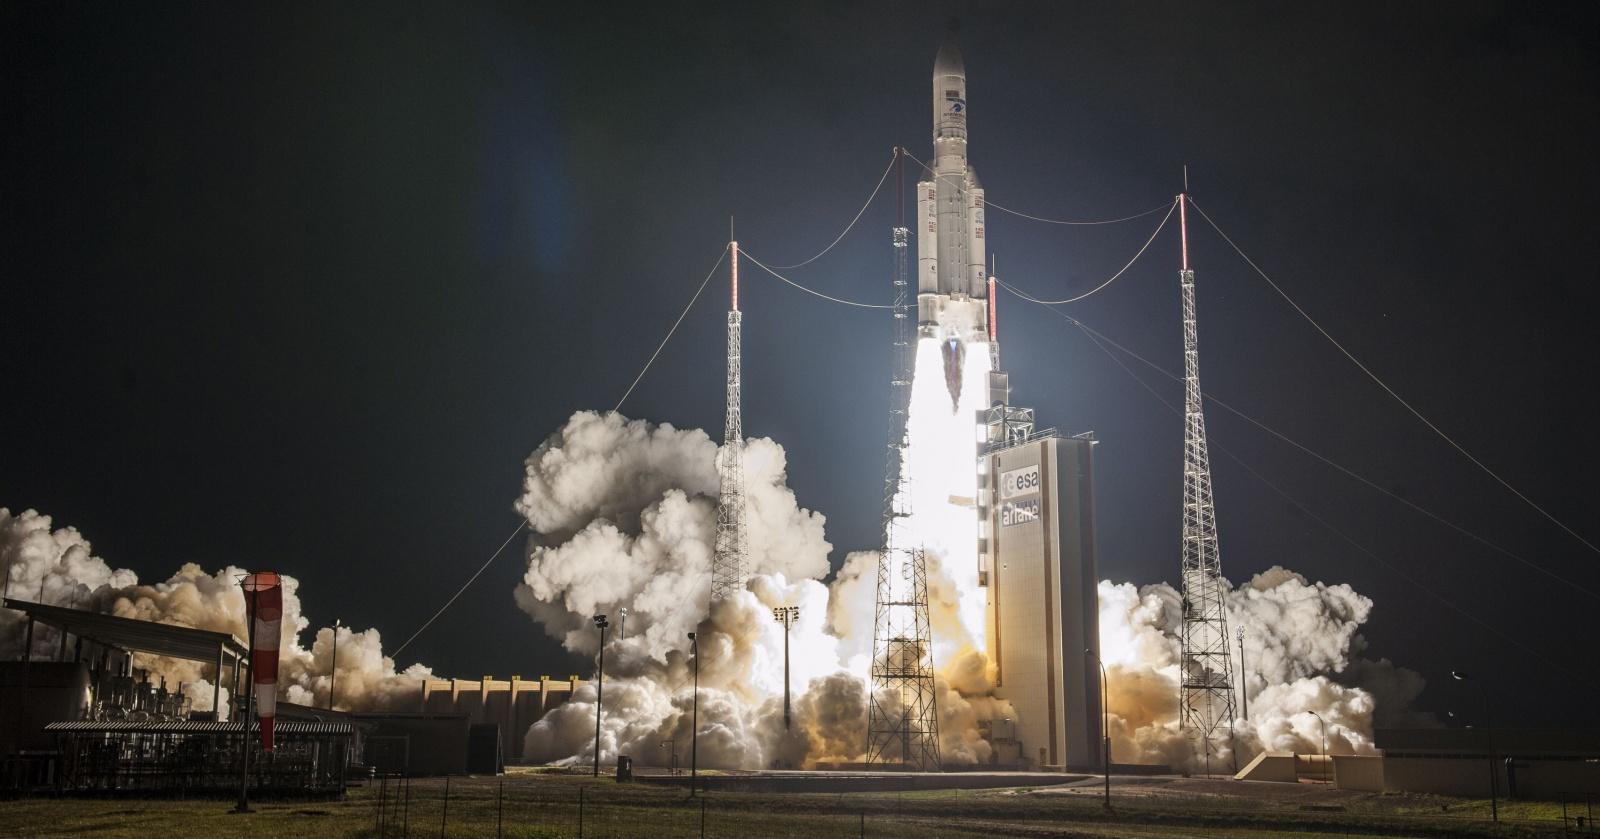 Прямая трансляция запуска Ariane 5 с космодрома Куру